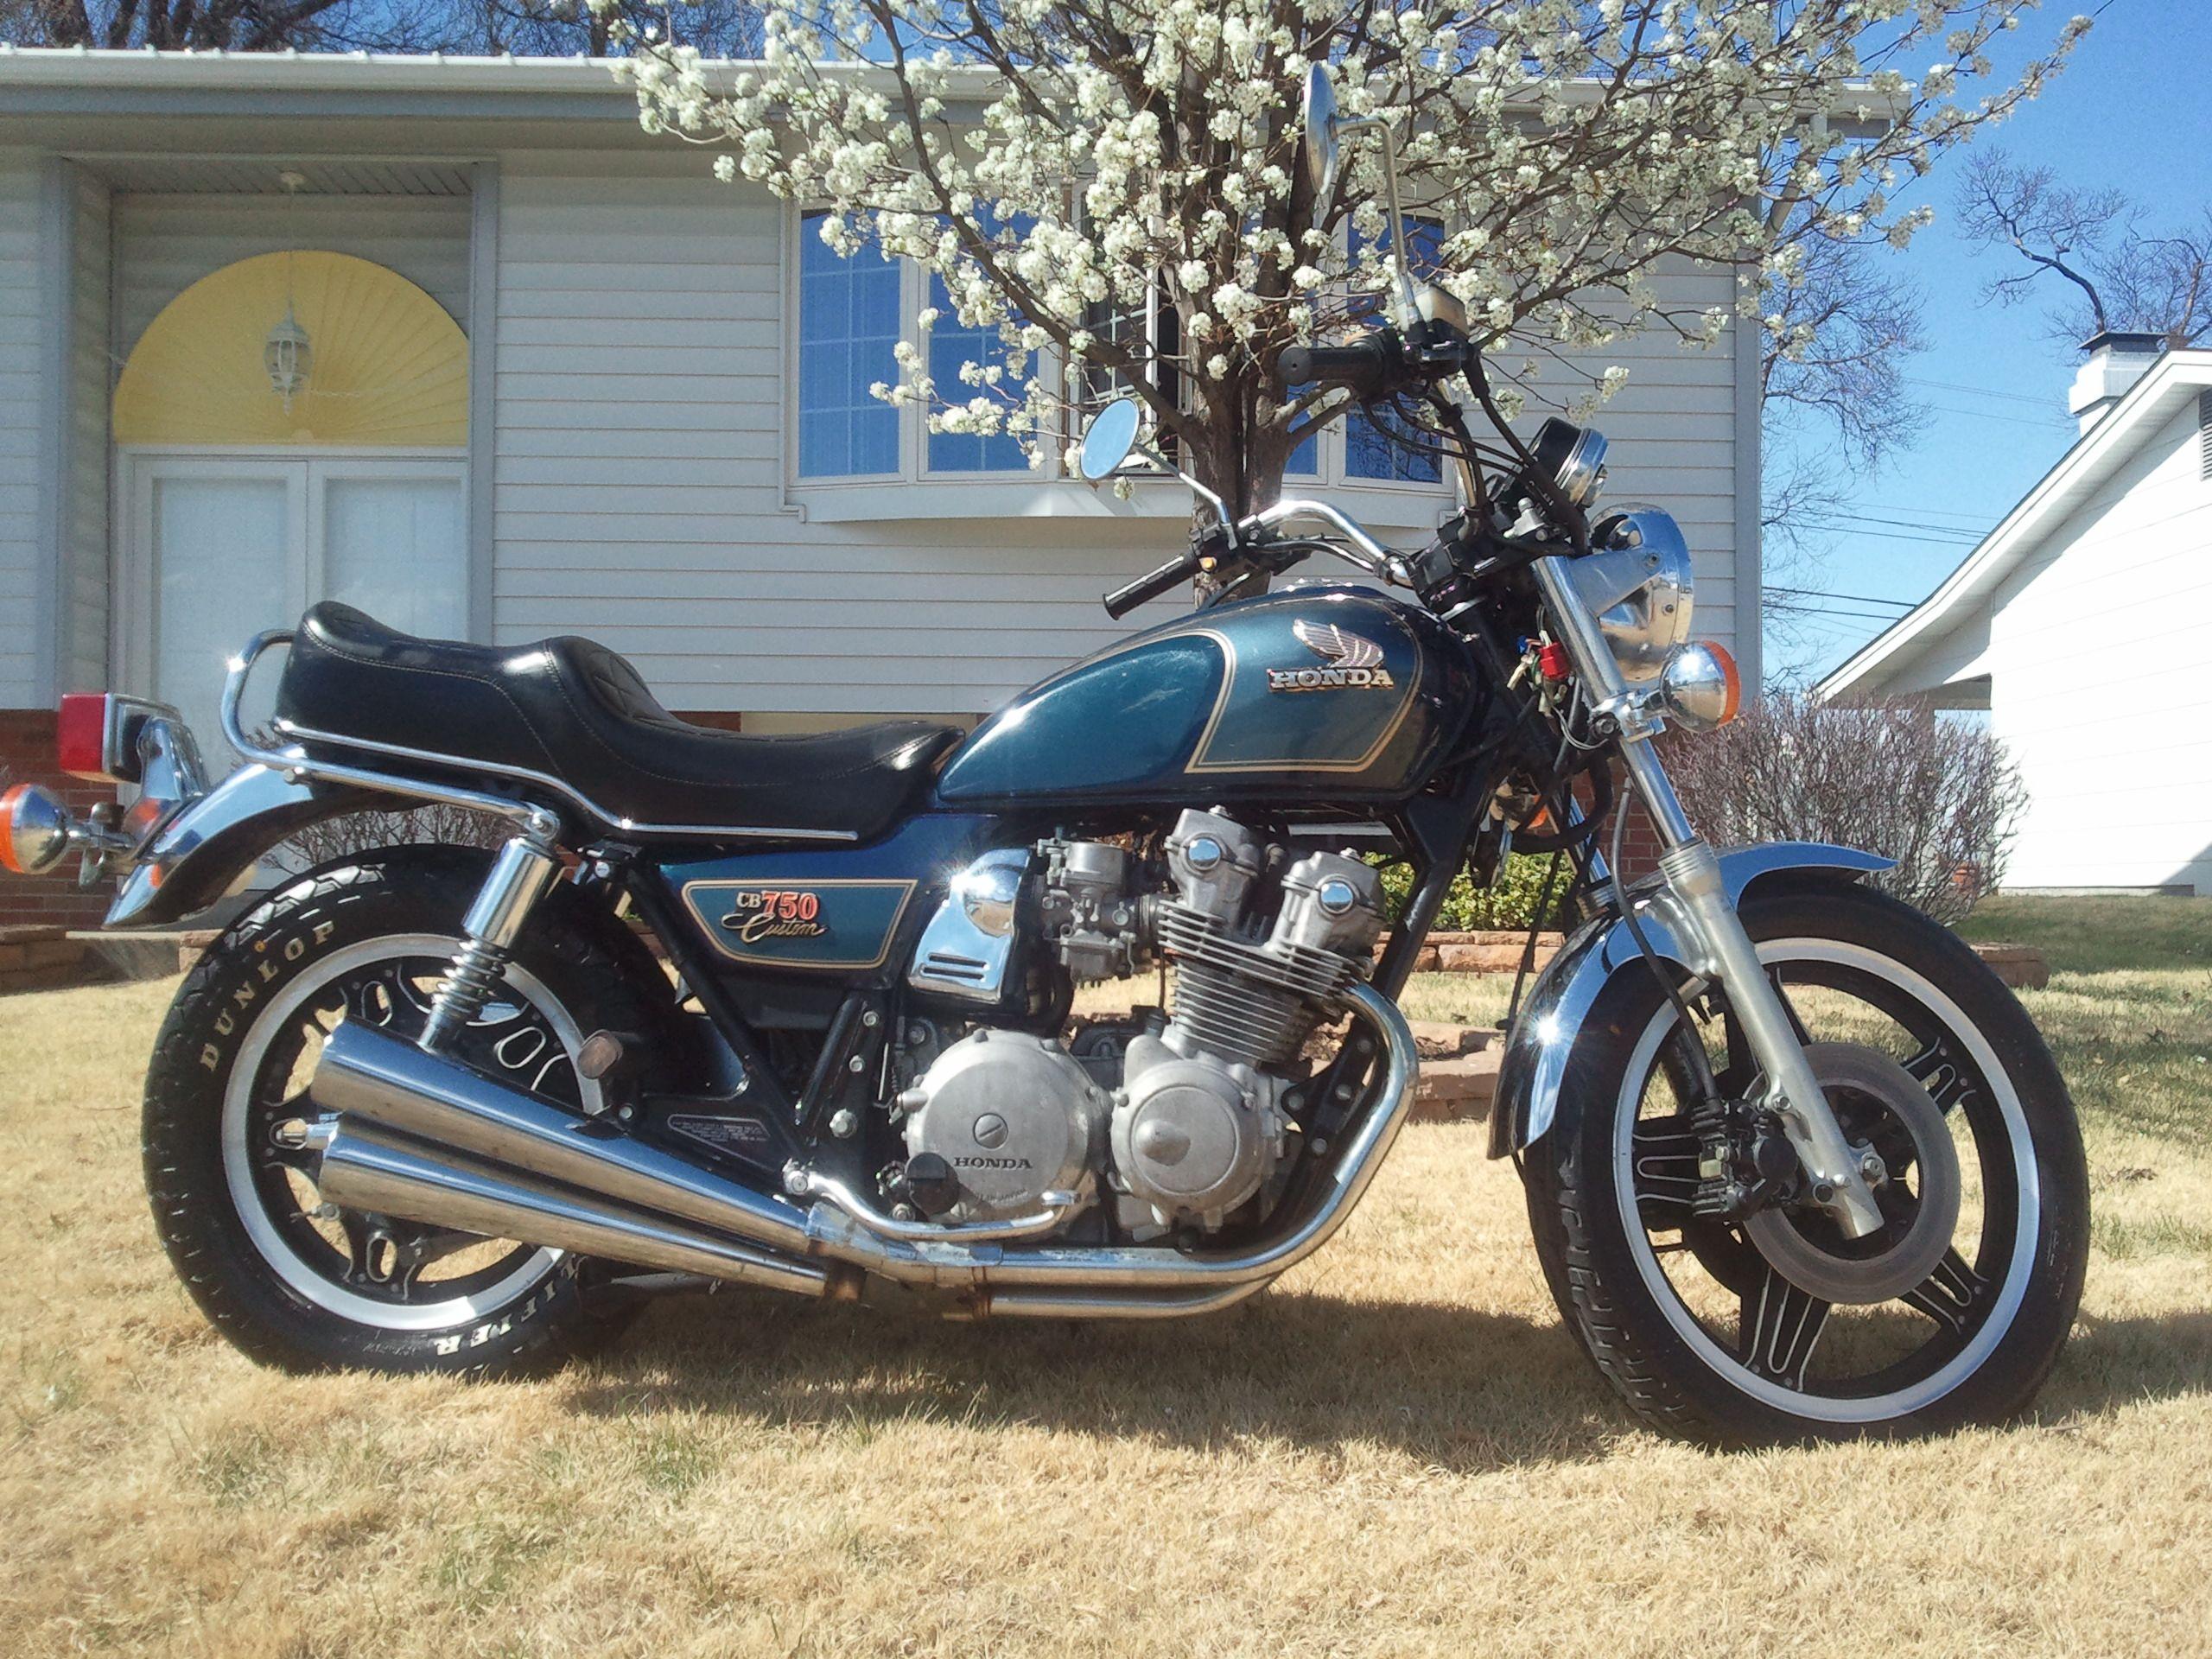 1981 Cb750 Custom 2011 Vintage Honda Motorcycles Honda Bikes Yamaha Bikes [ 1920 x 2560 Pixel ]